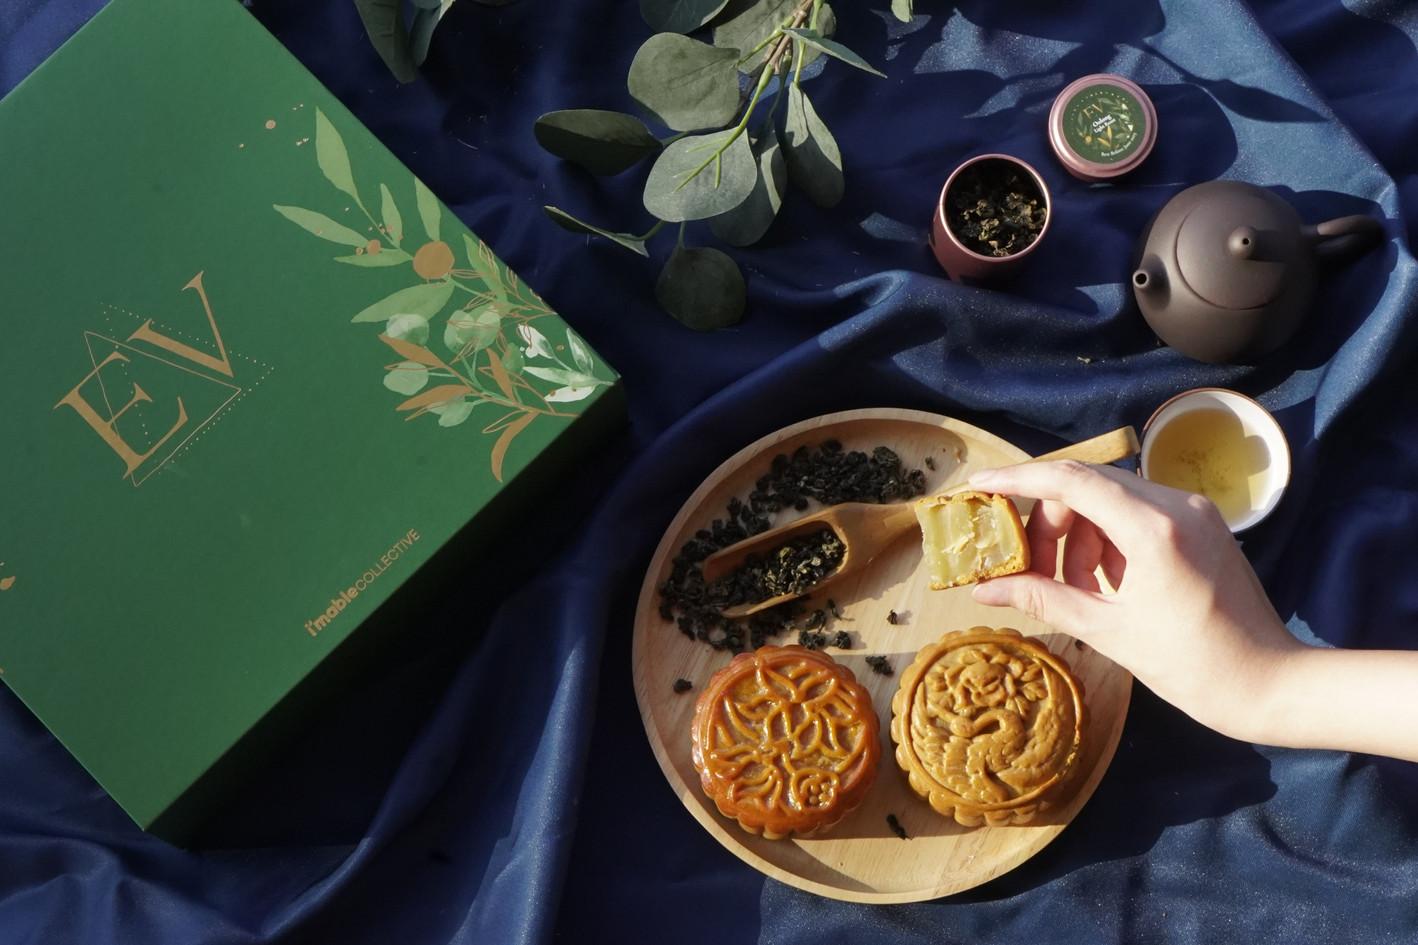 The EV Mooncake Gift Set contains 2 mooncakes, 1 teapot set, and 2 mini-tins.